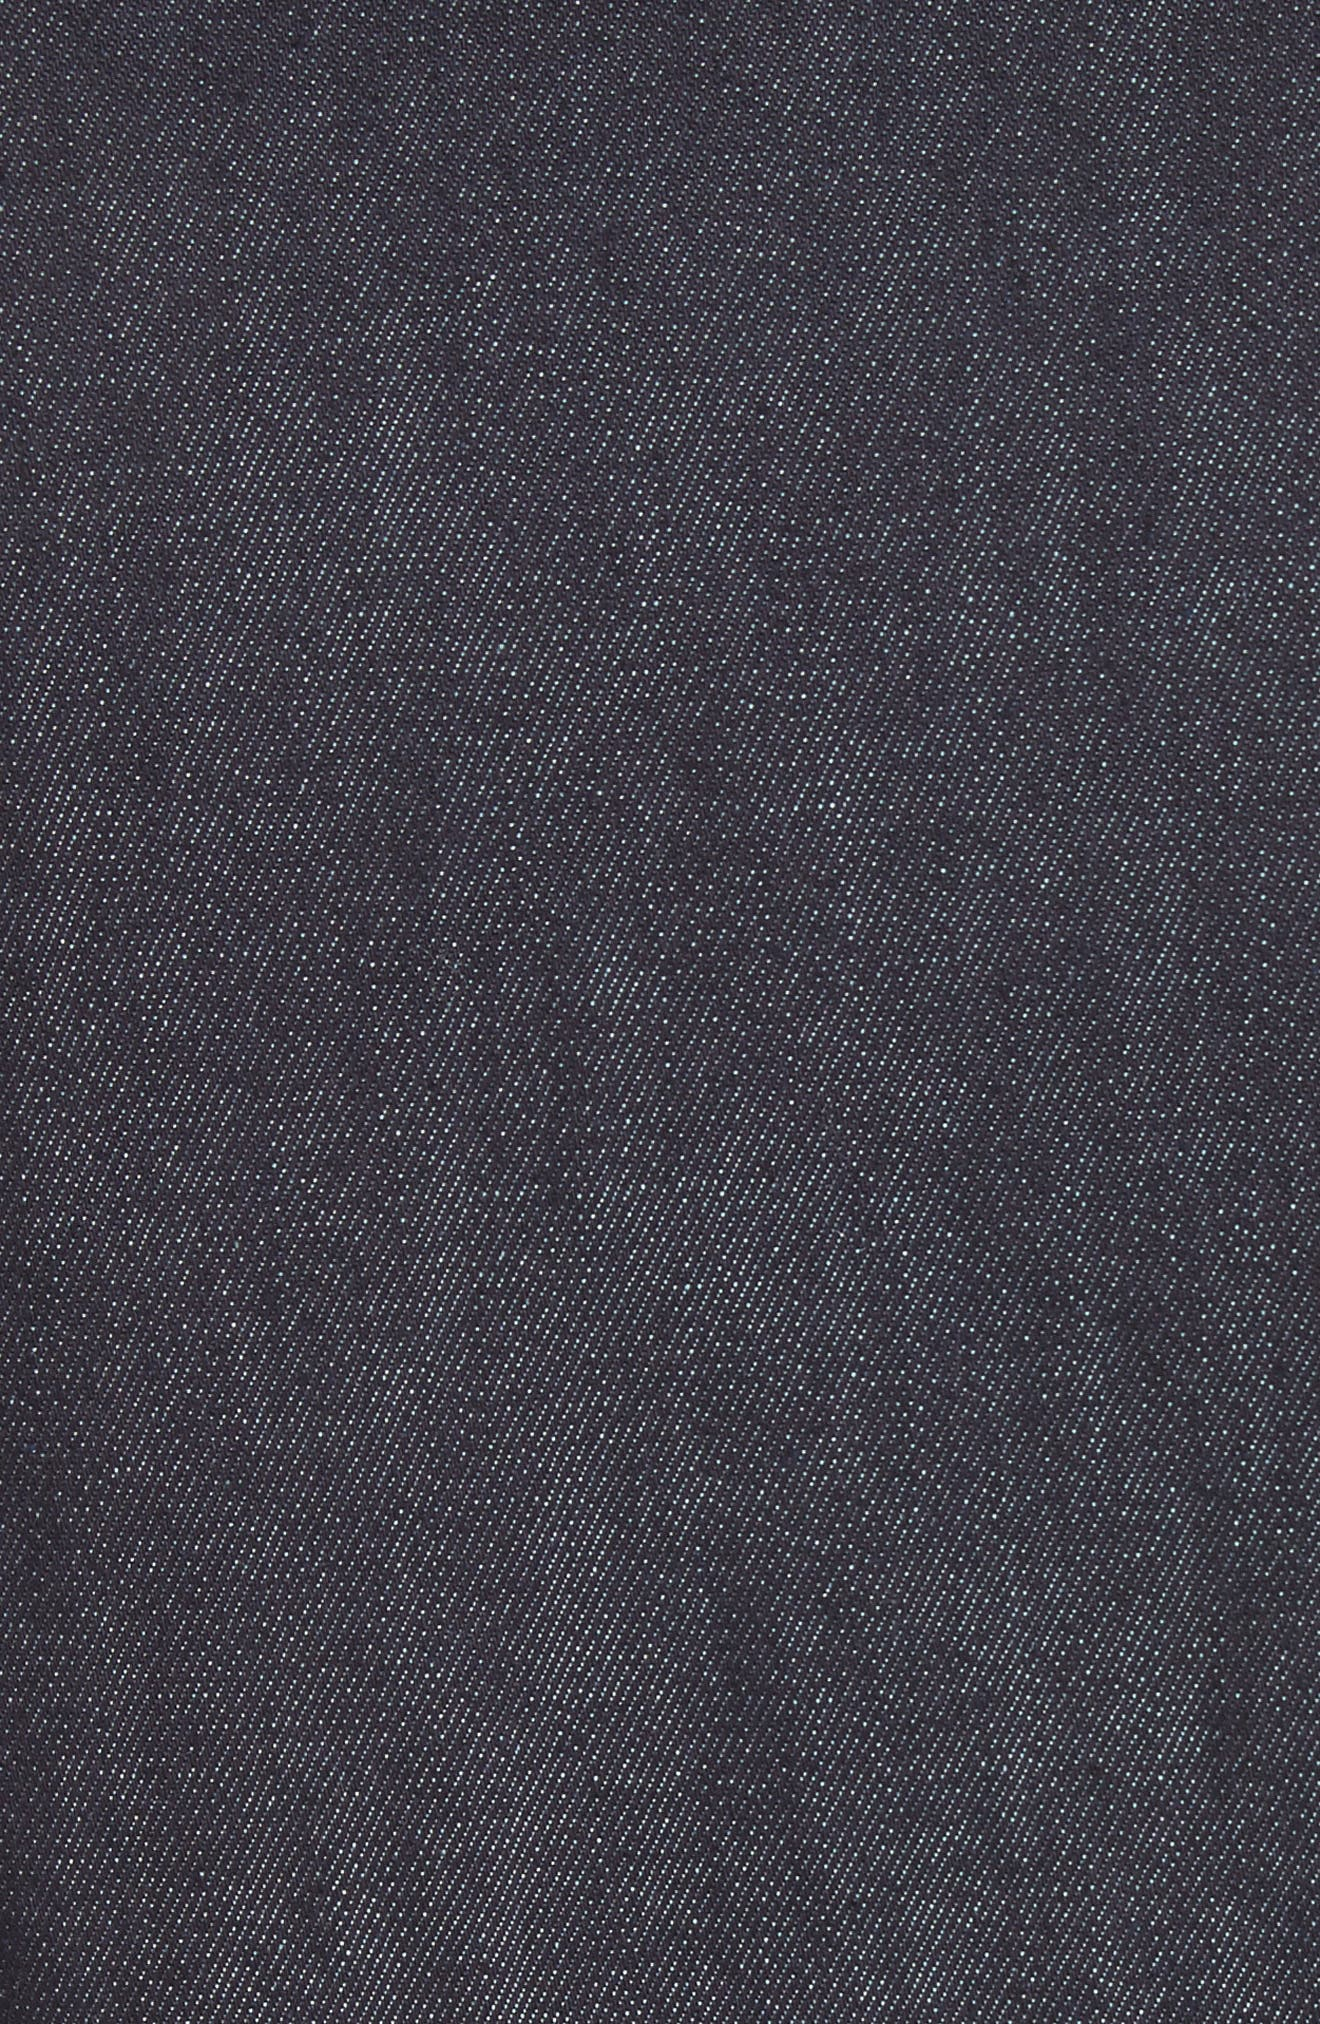 embroidered denim shirtdress,                             Alternate thumbnail 5, color,                             429